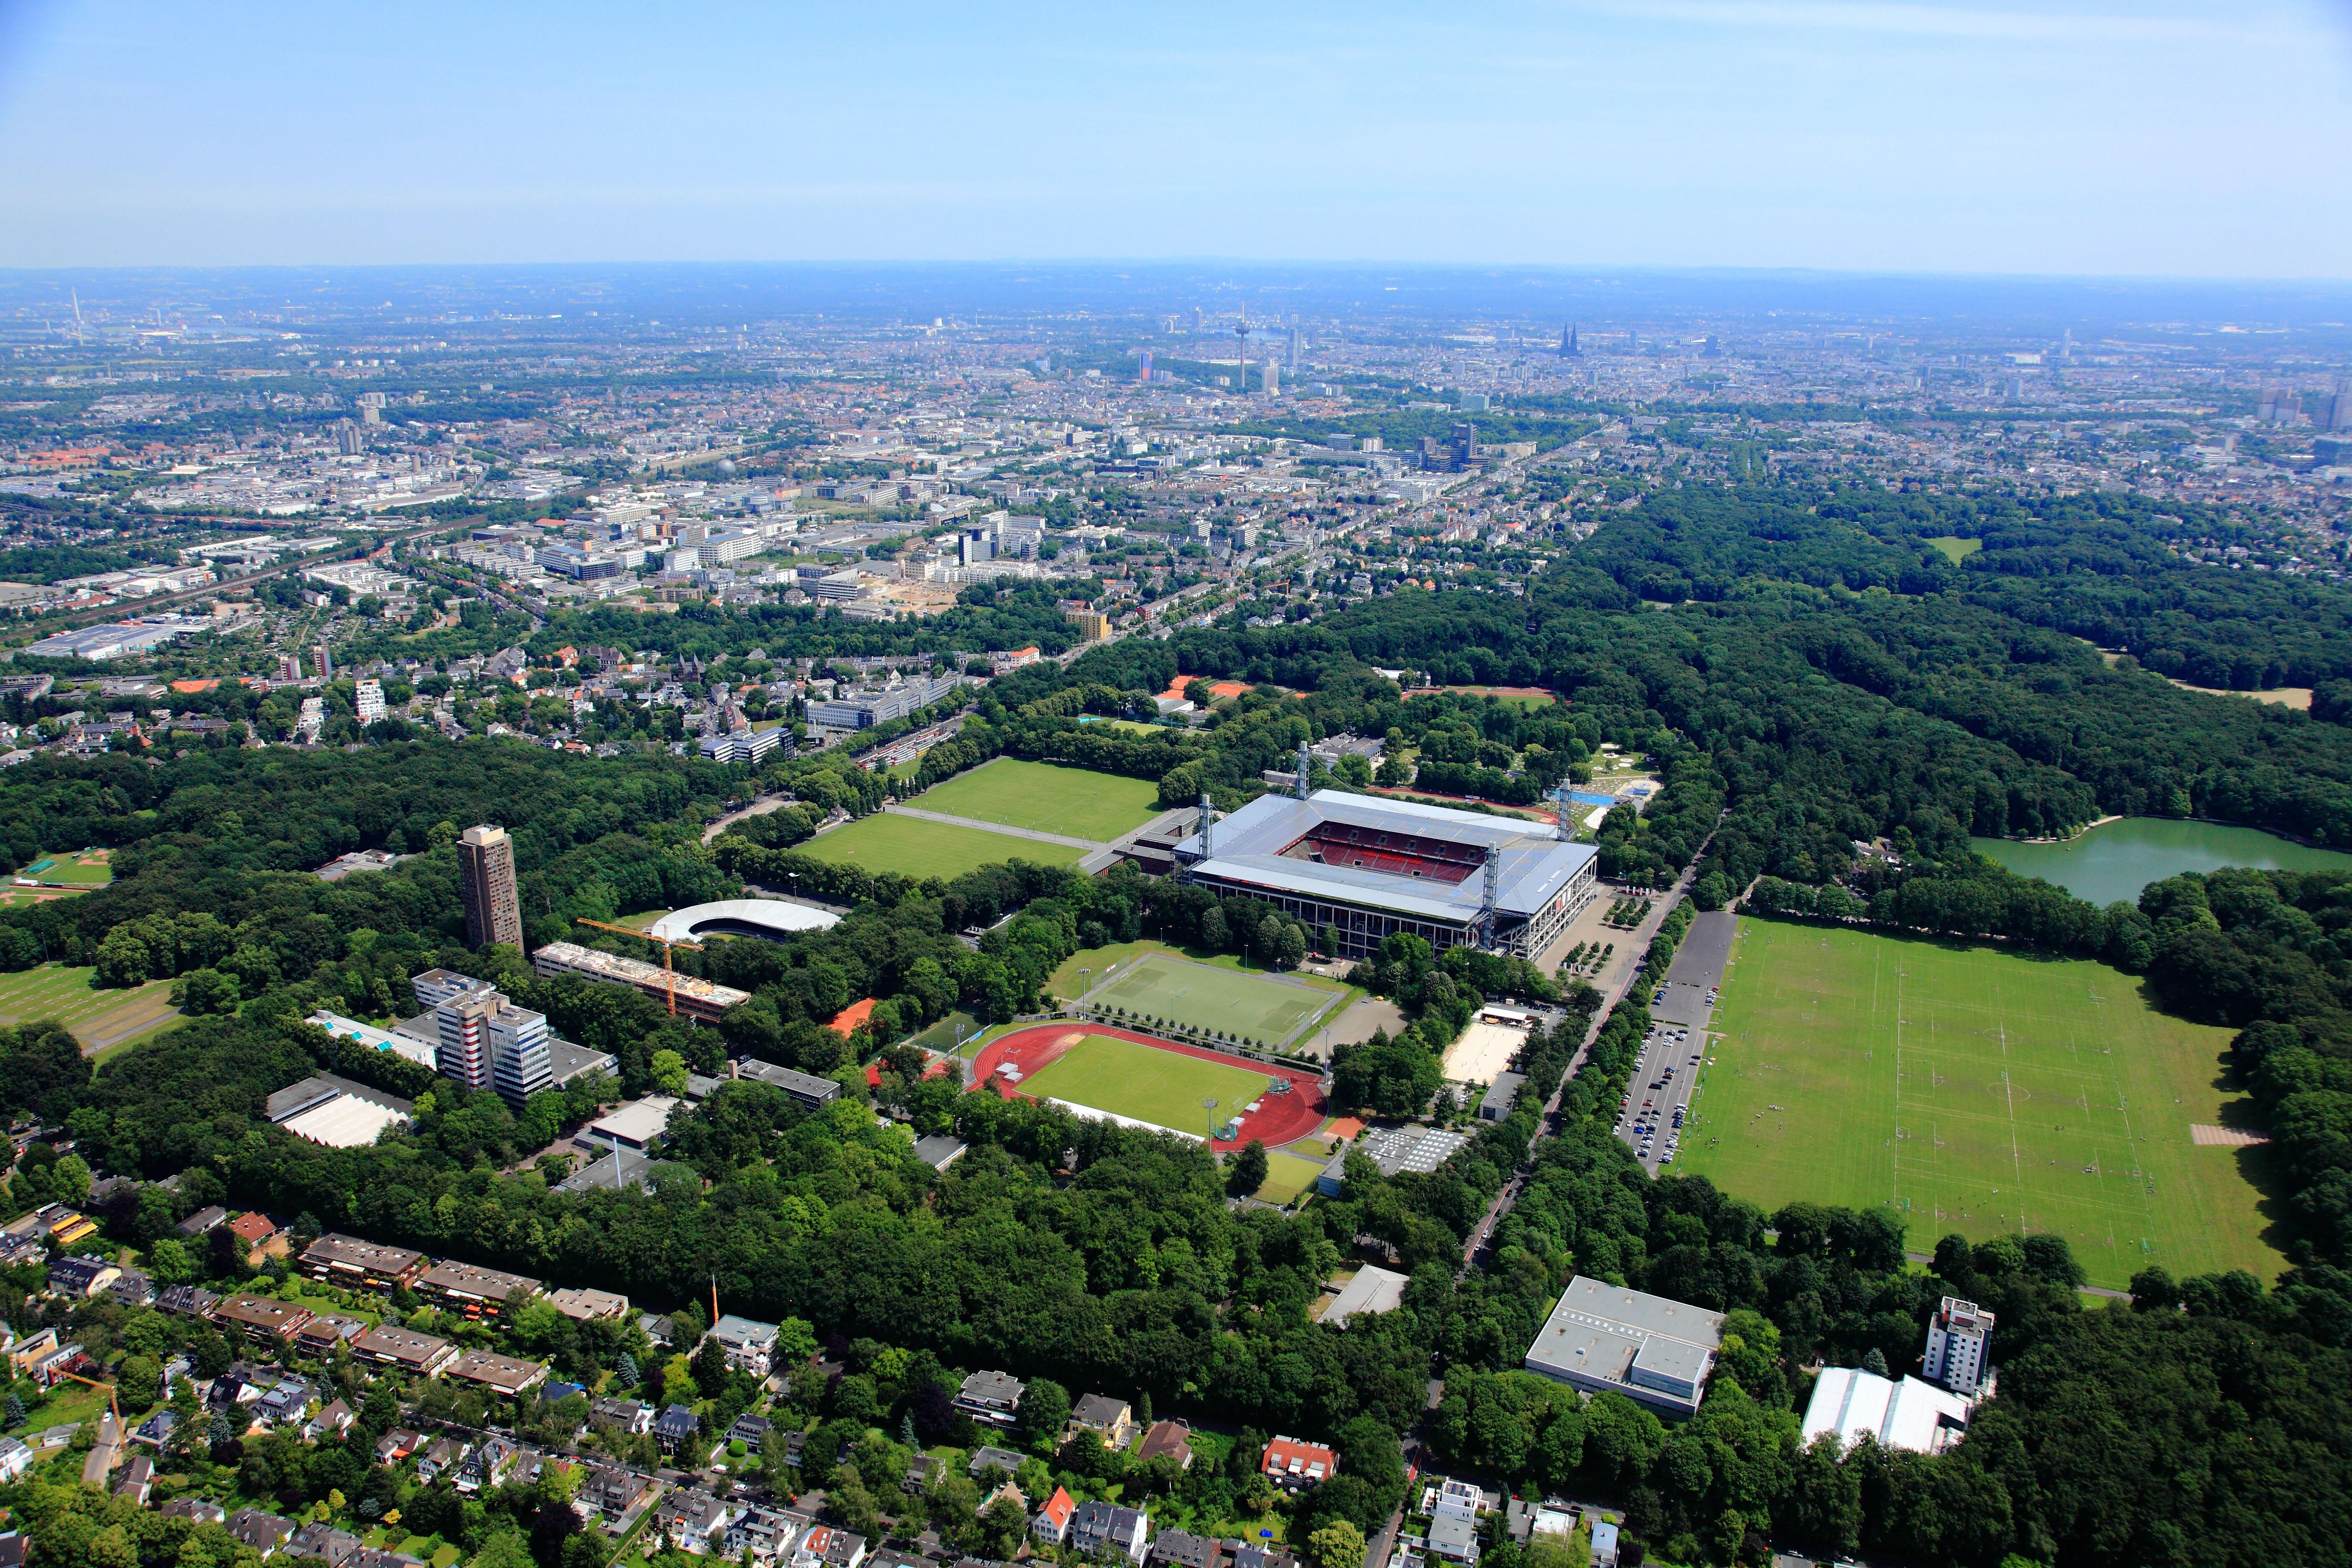 Rhein Energie Sportpark